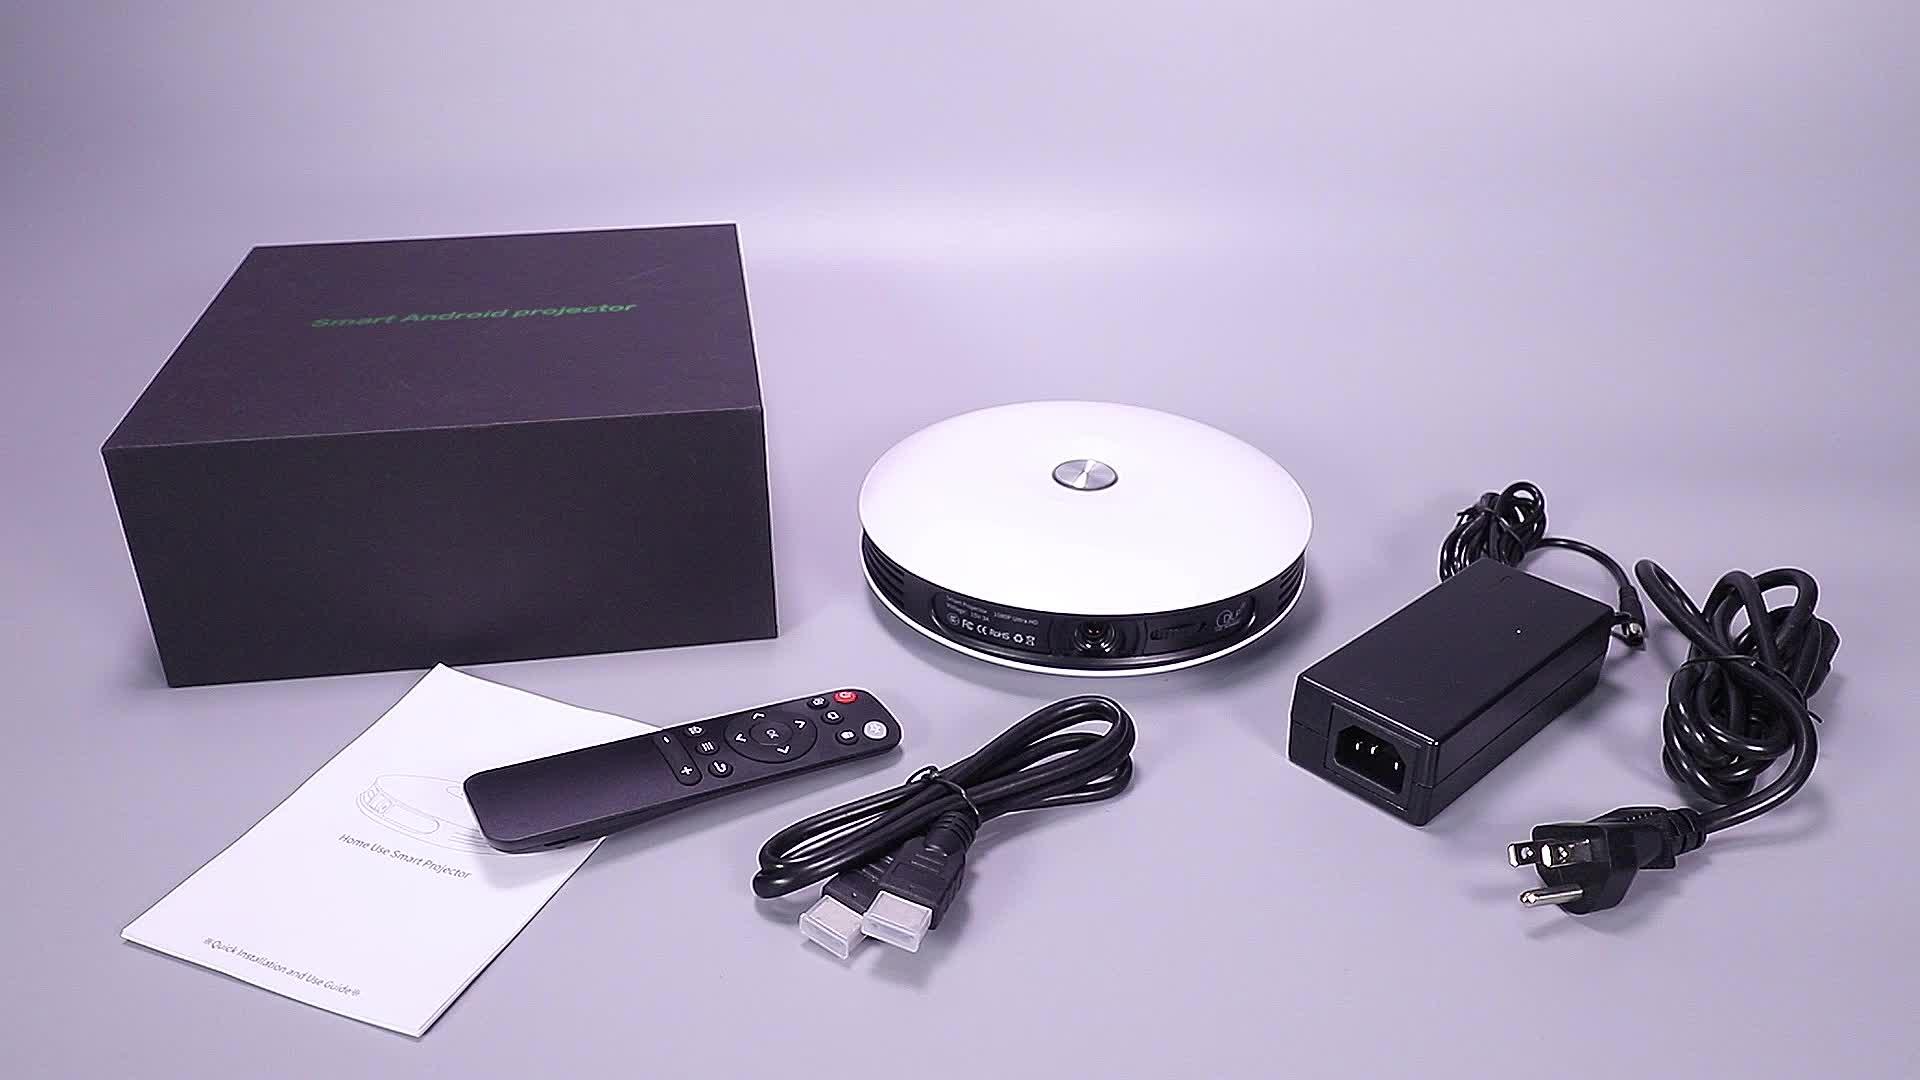 DLP 250 ANSI Lumens Eight Core HD LCD 3D Portable 4 K LED Portable Mini Home Theater Proyektor